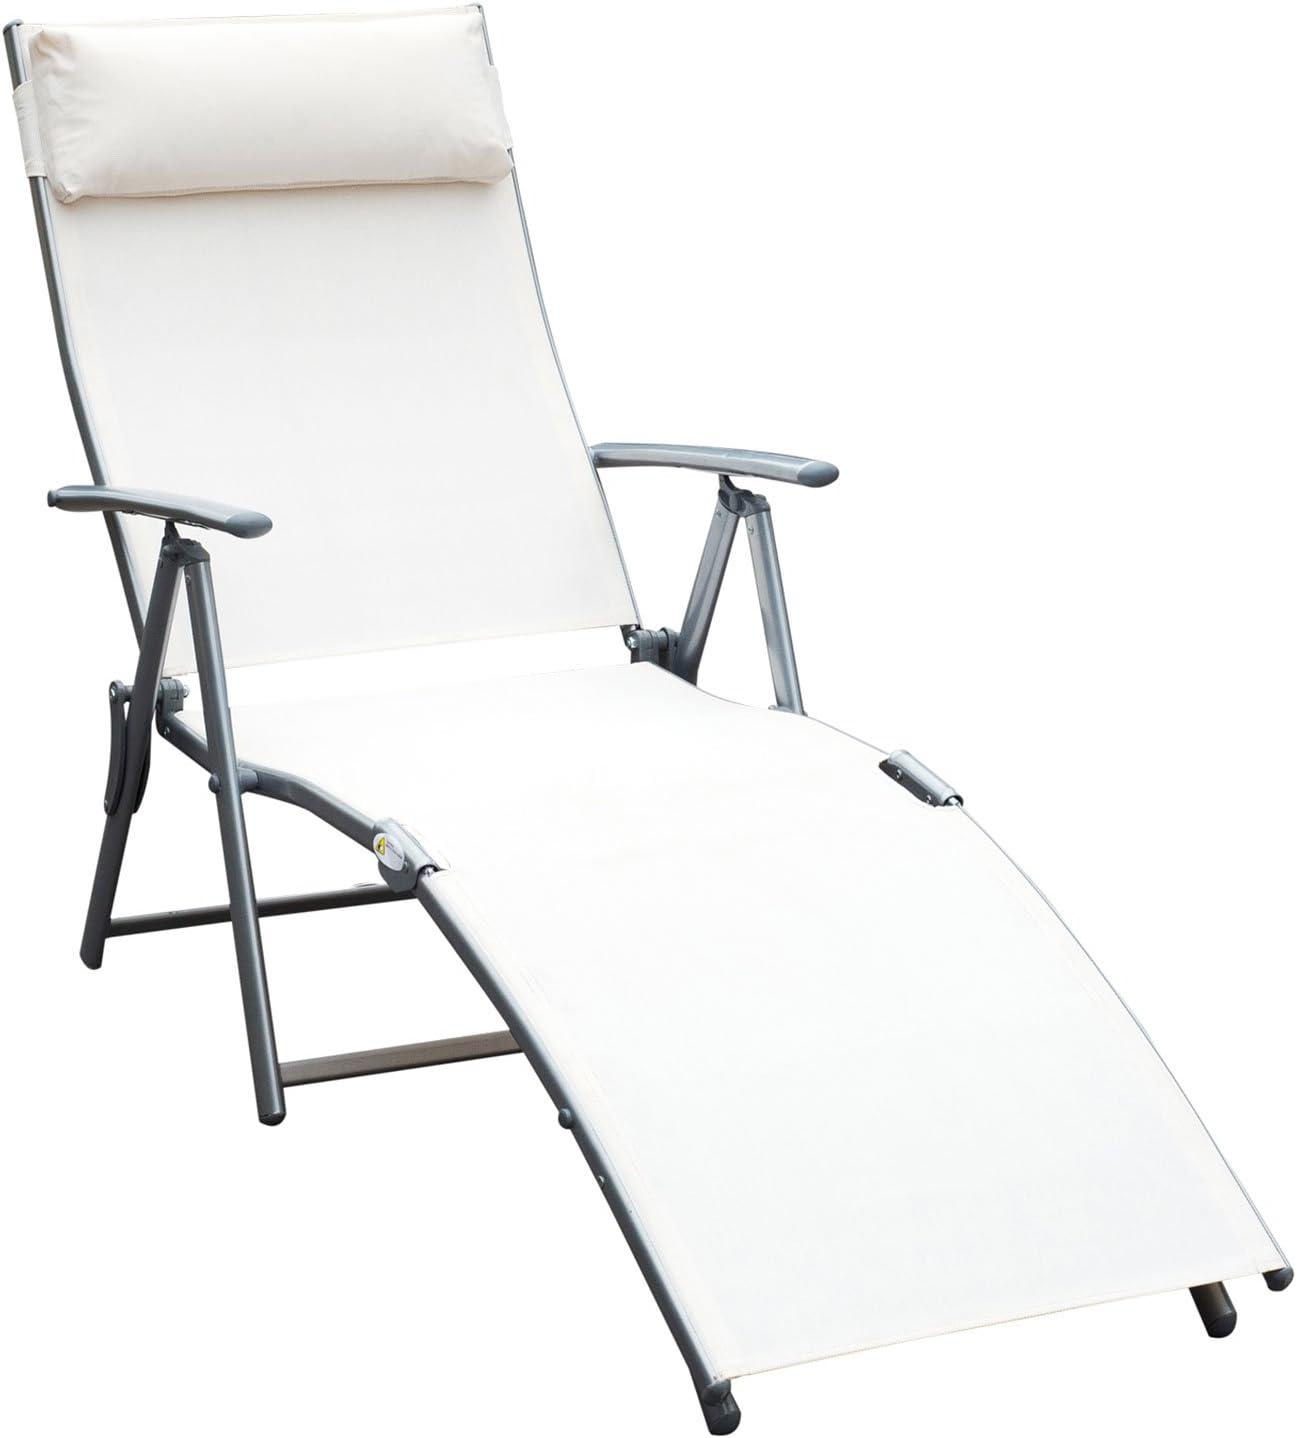 Amazon.com: Silla reclinable plegable para piscina y playa ...